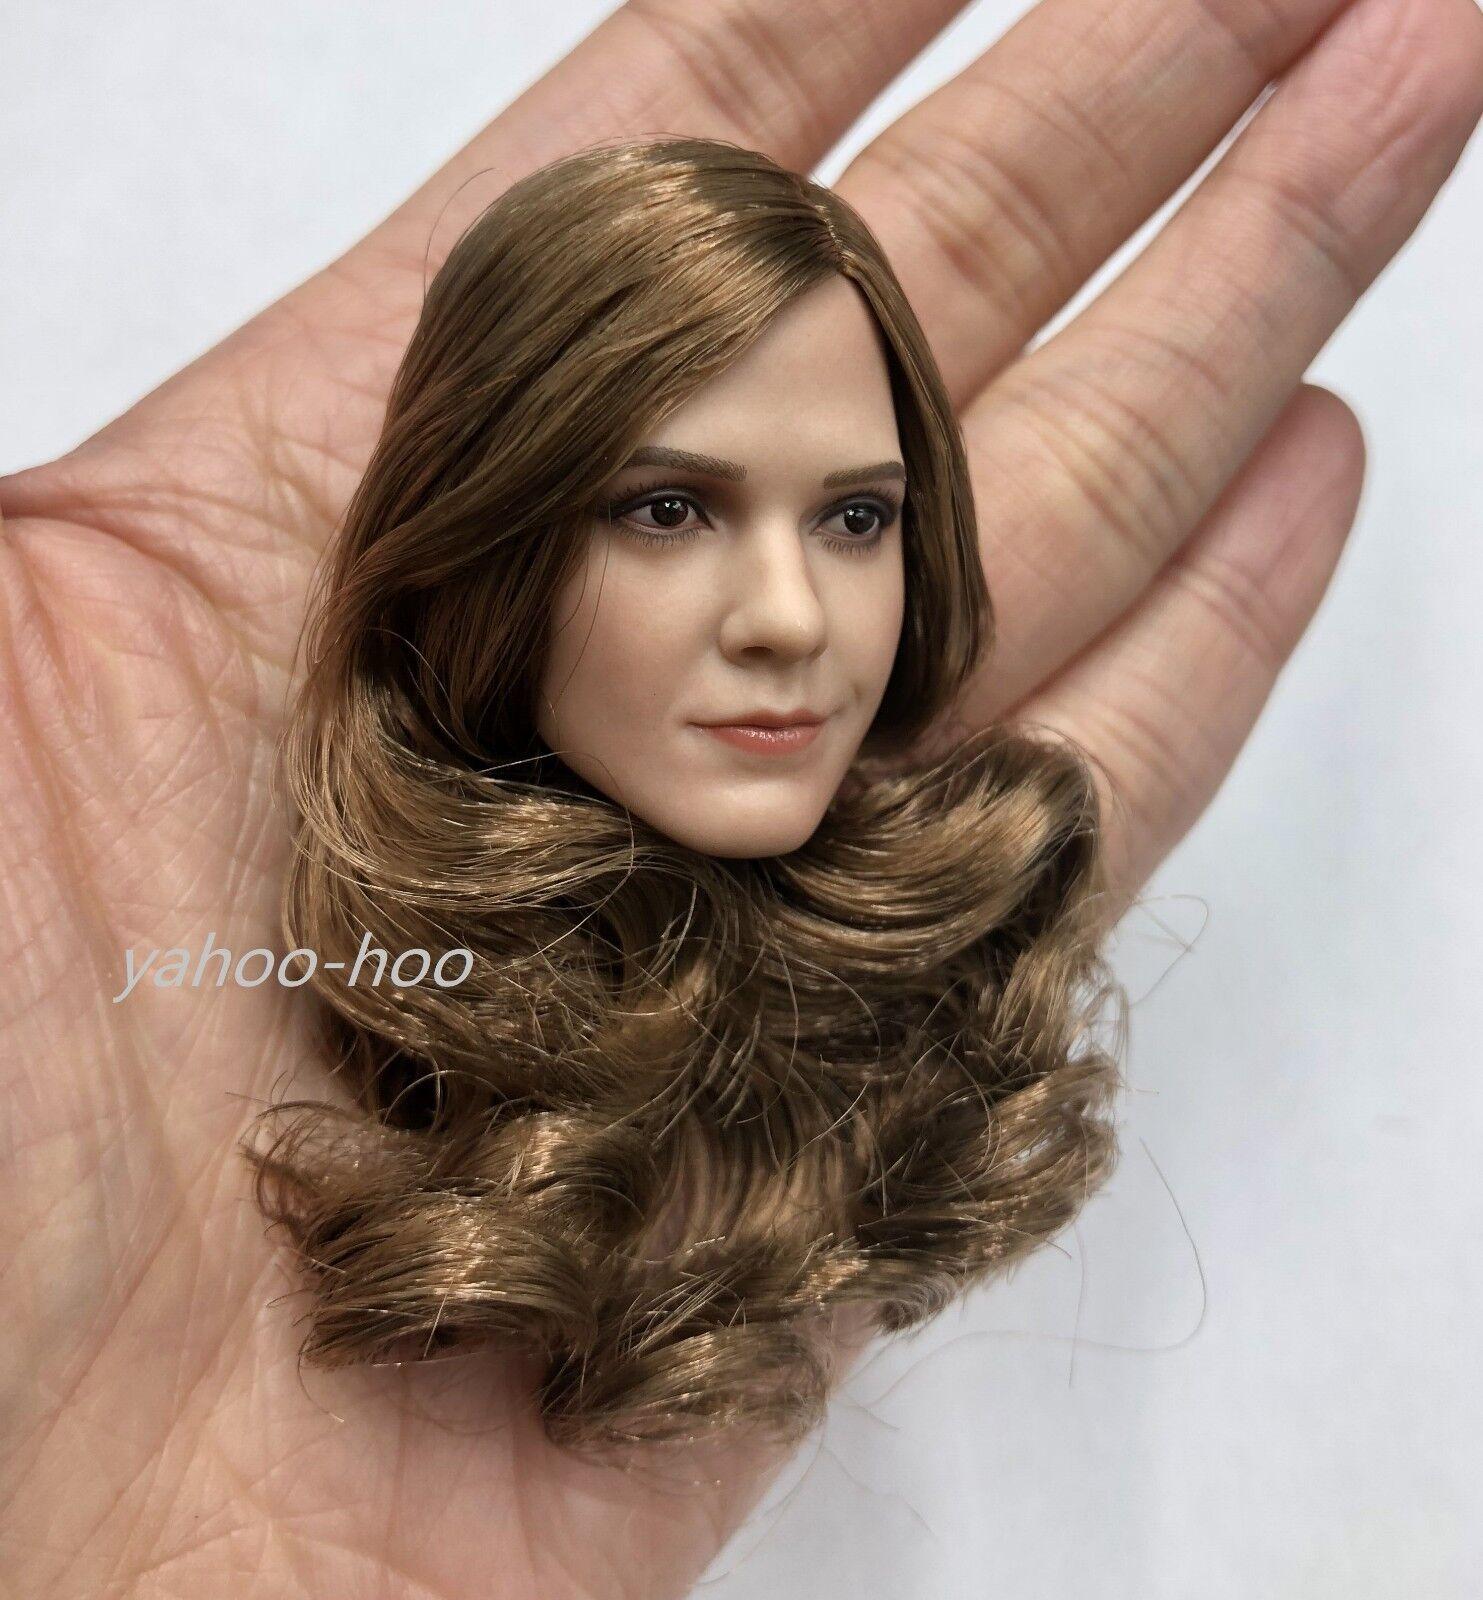 1 6 Emma Watson Head Sculpt Sculpt Sculpt with Curly Hair Harry Potter Hermione For 12  PHICEN c60603